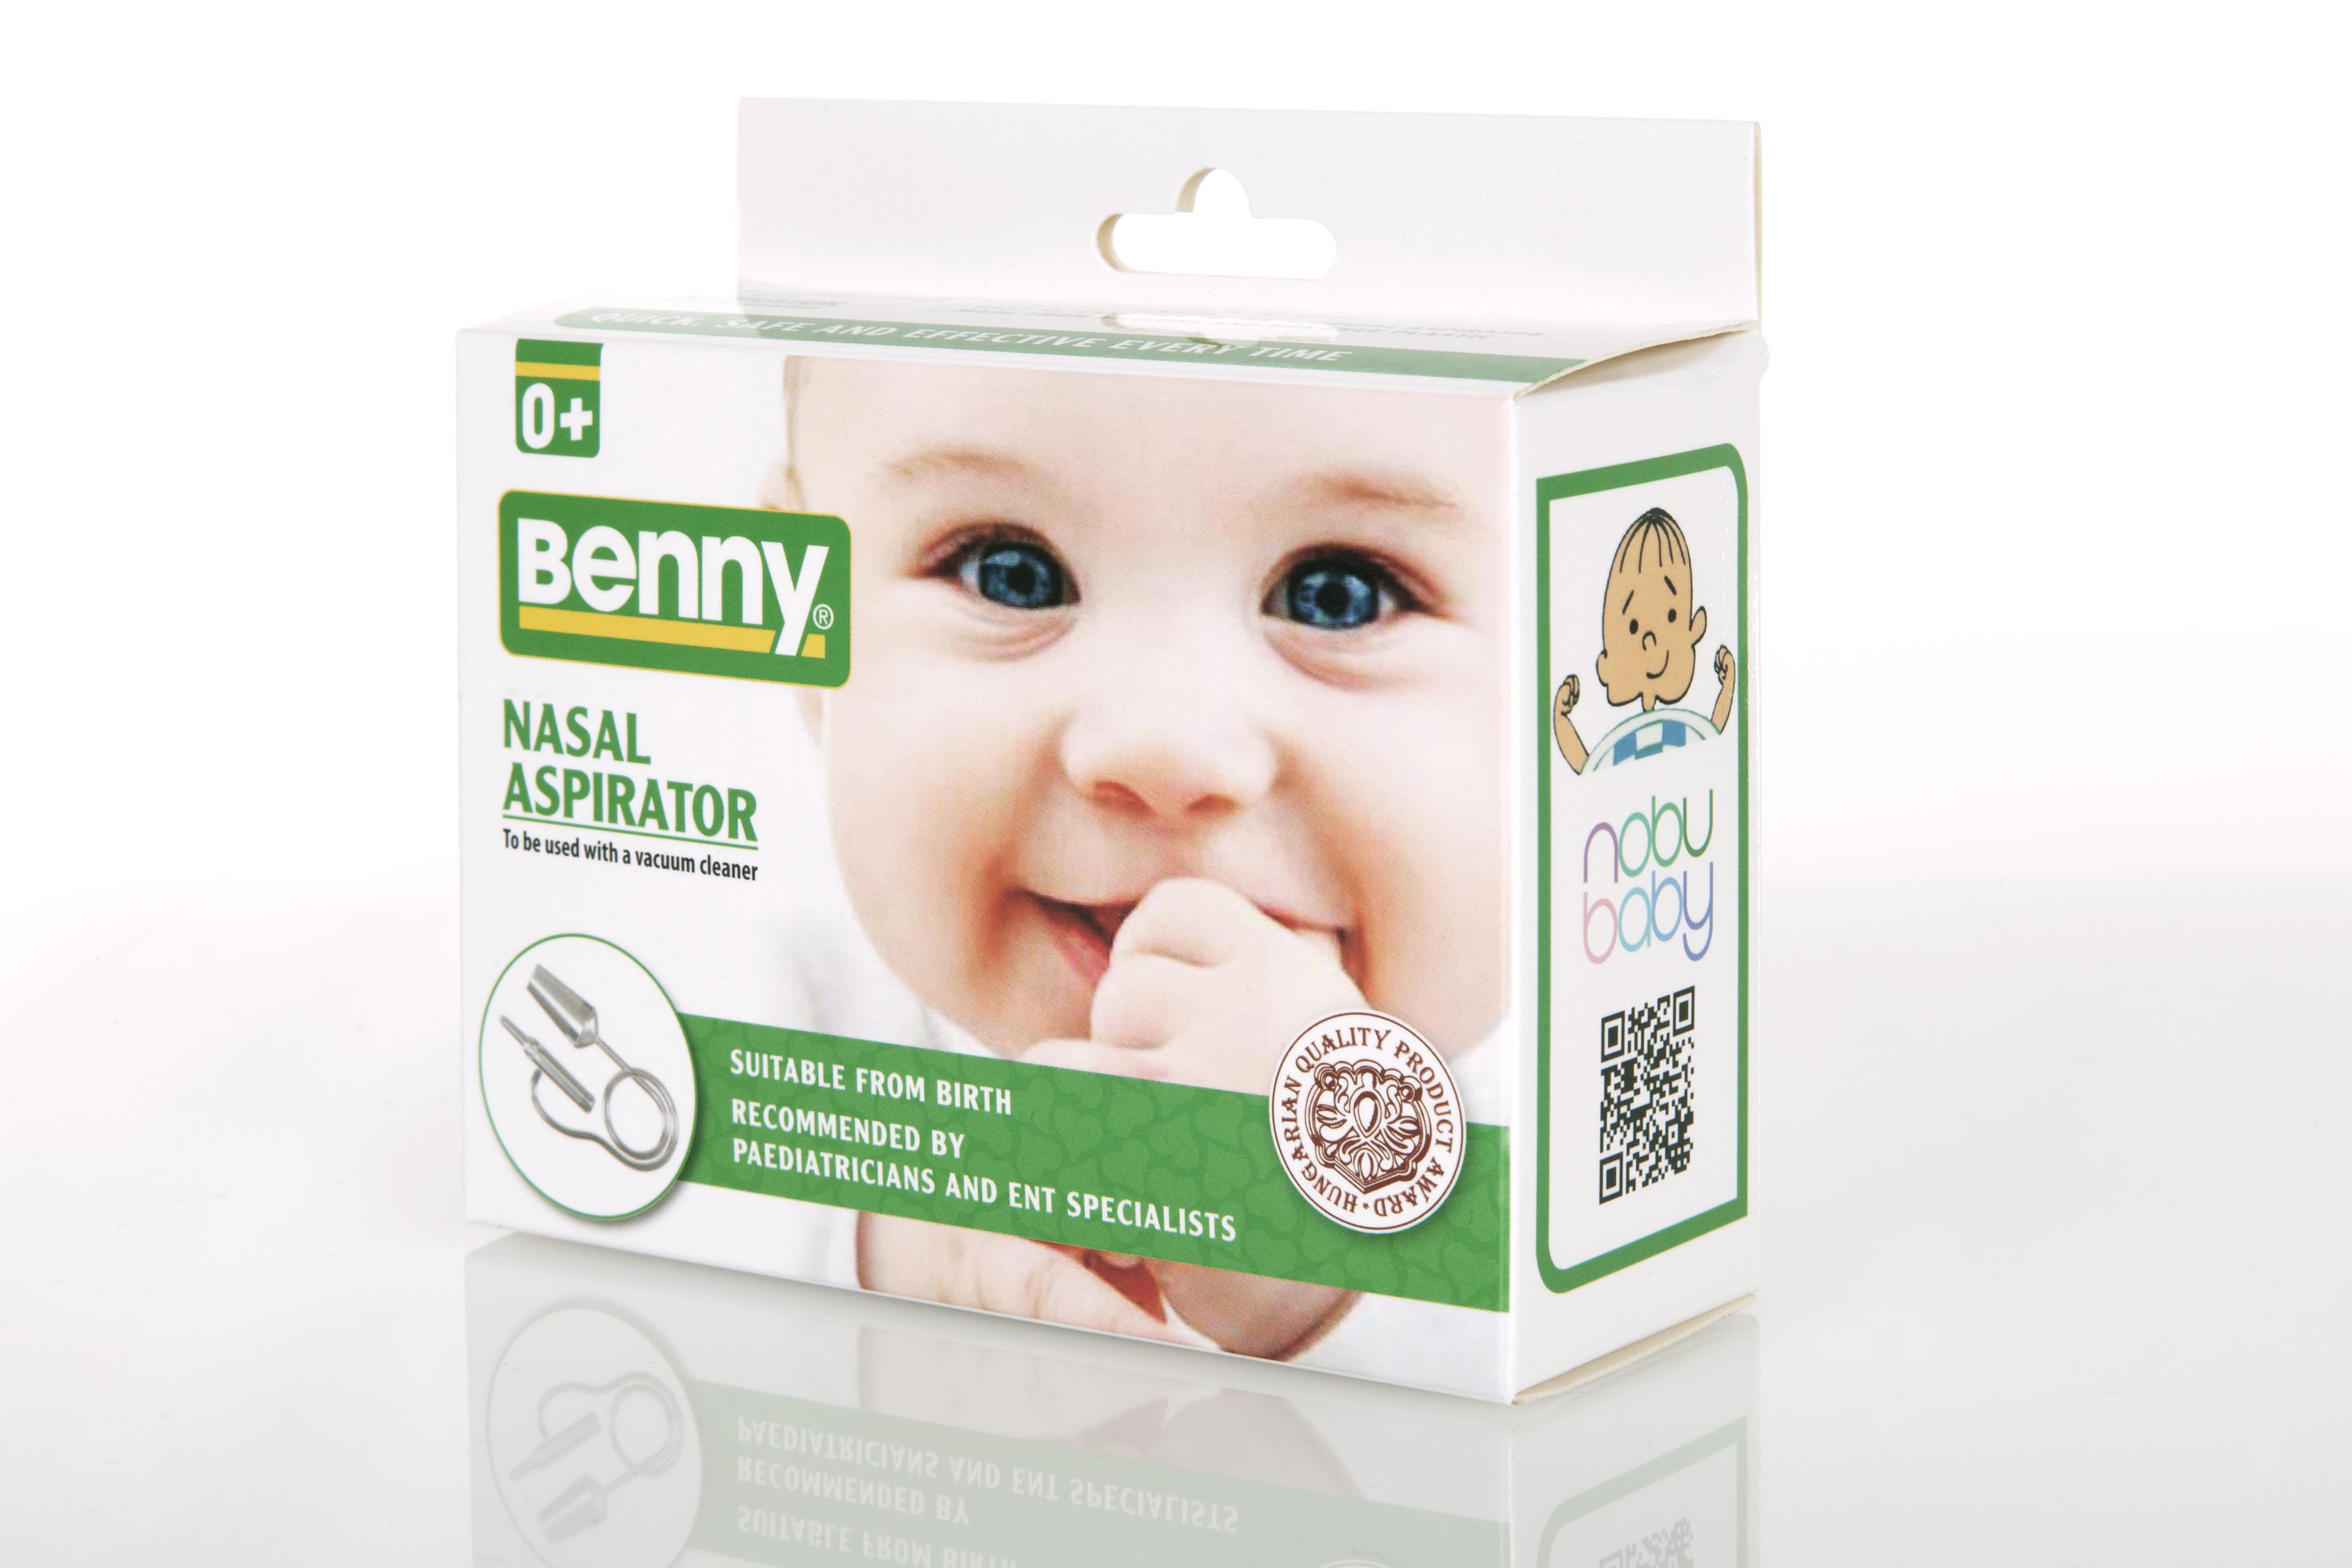 Benny Nasal Aspirator Even For 7 Years Old 0 Nobu Baby